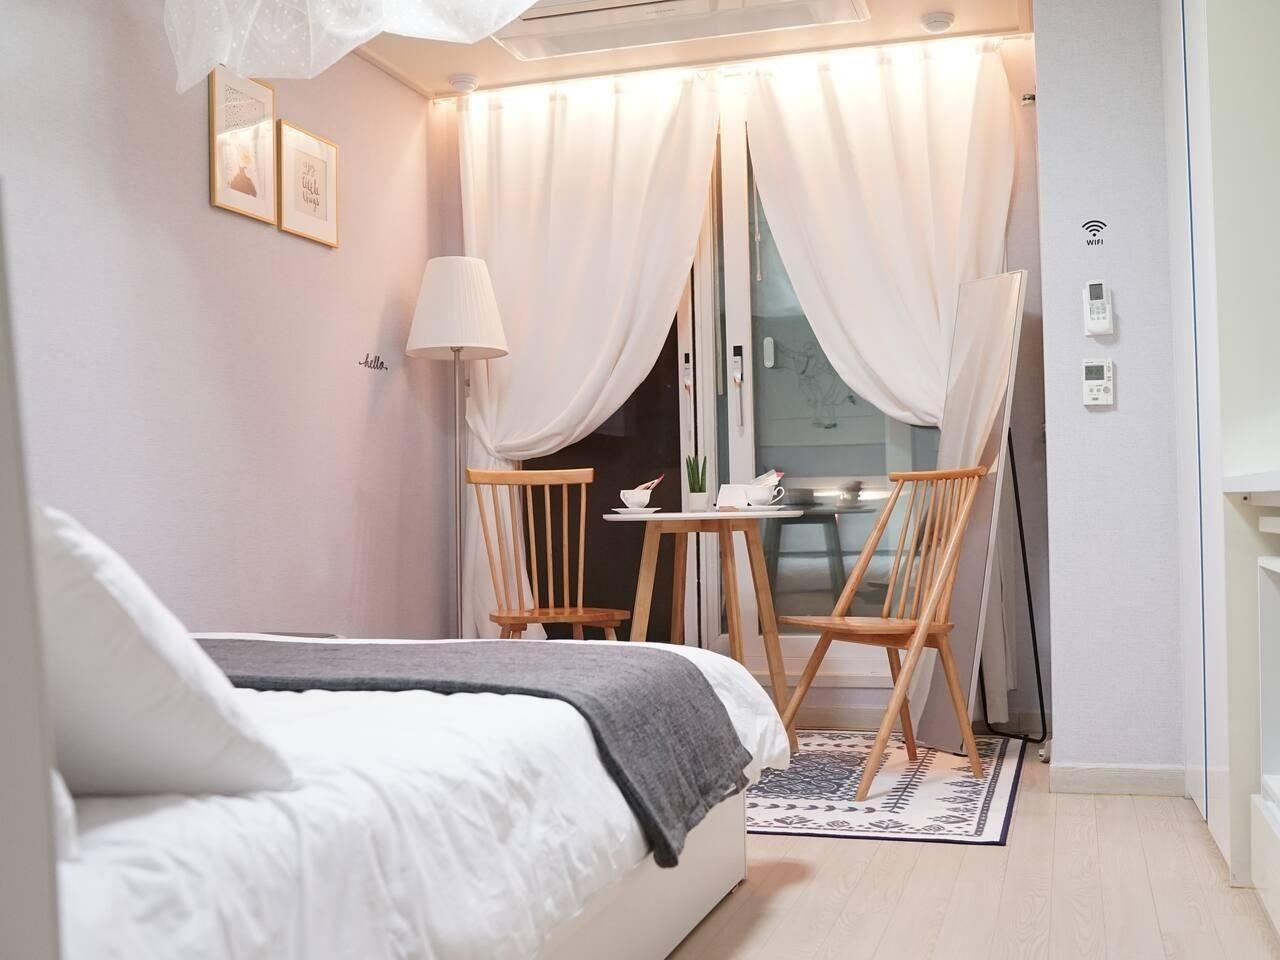 Квартира в 10 минутах от госпиталя, во время лечения в Корее